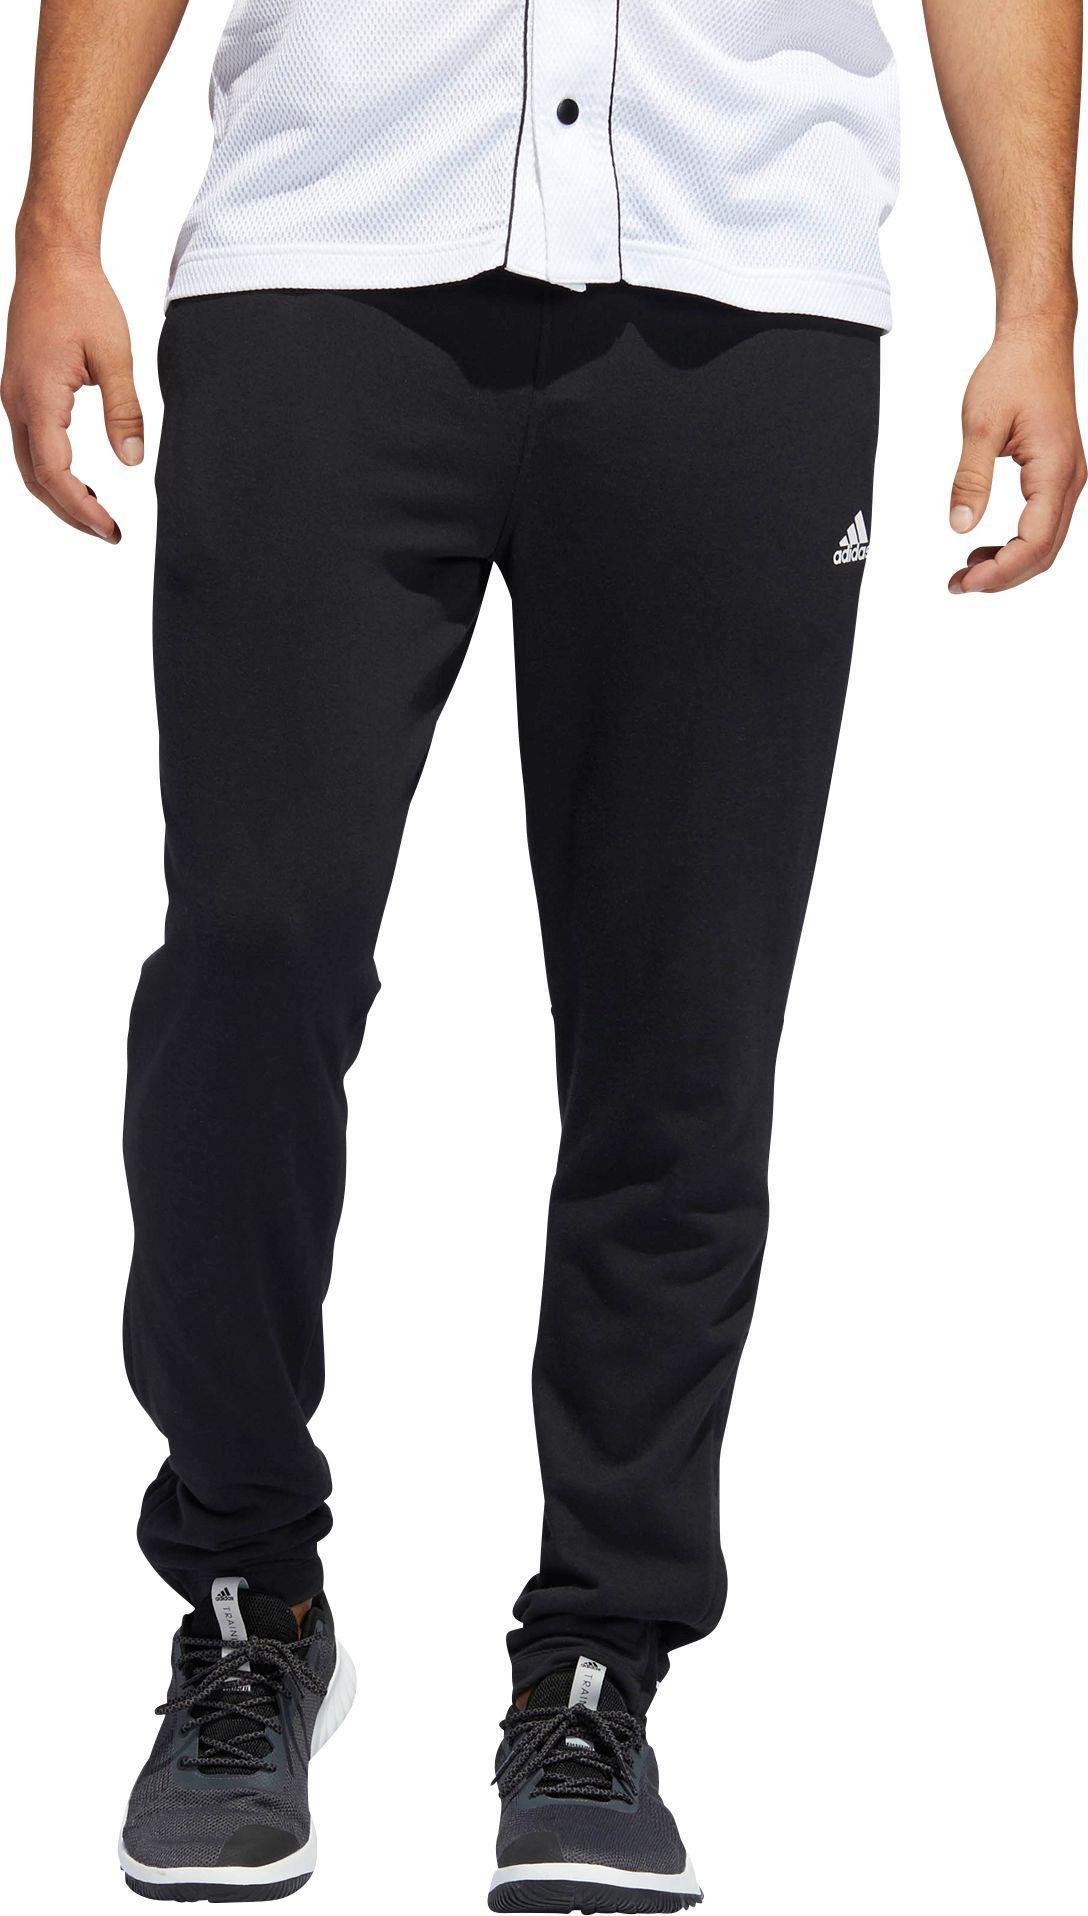 meet 00fb8 3d3b5 adidas. Men s Black Sport 2 Street Pants